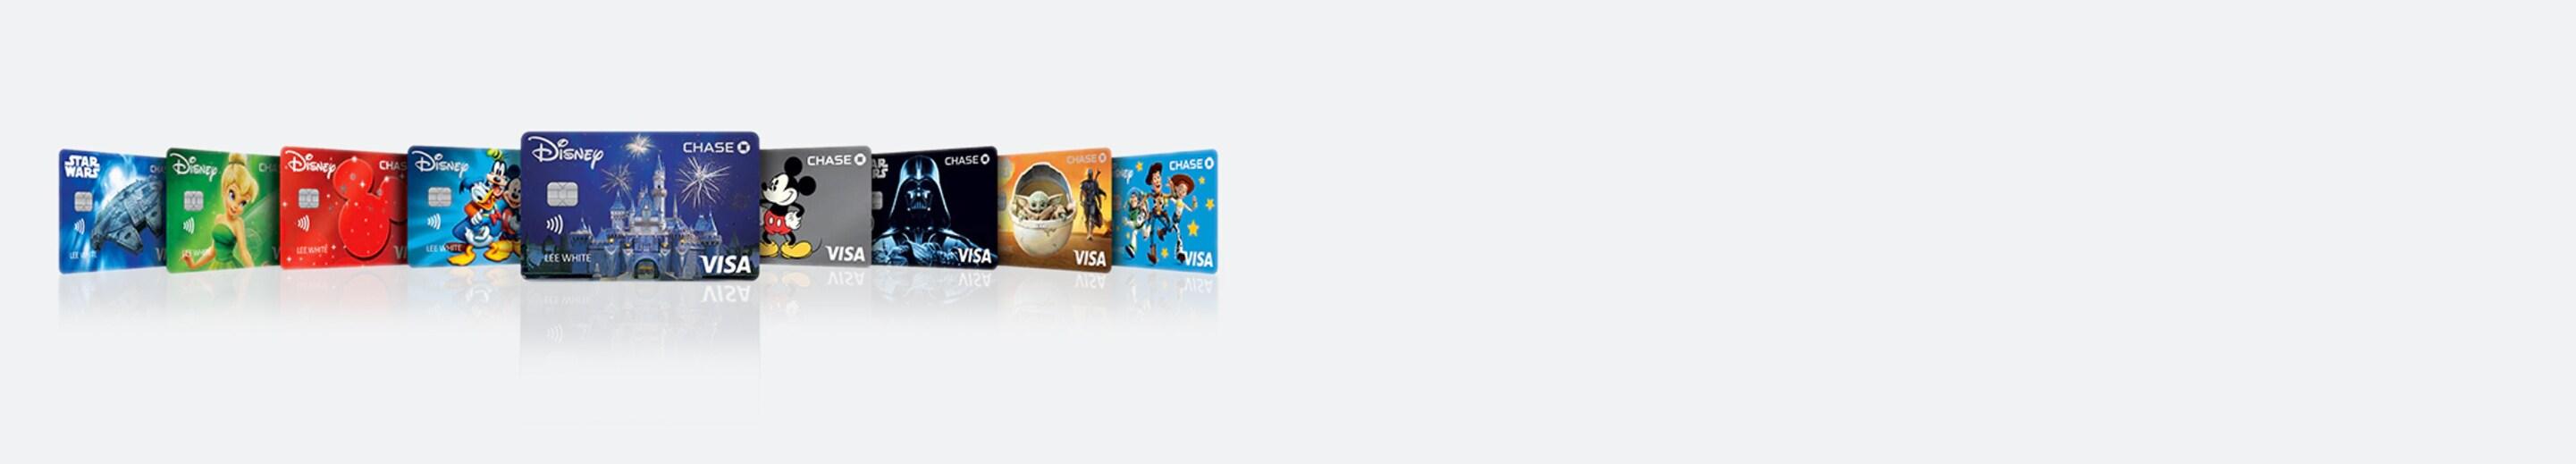 Hero - Visa Banner 2021 $300